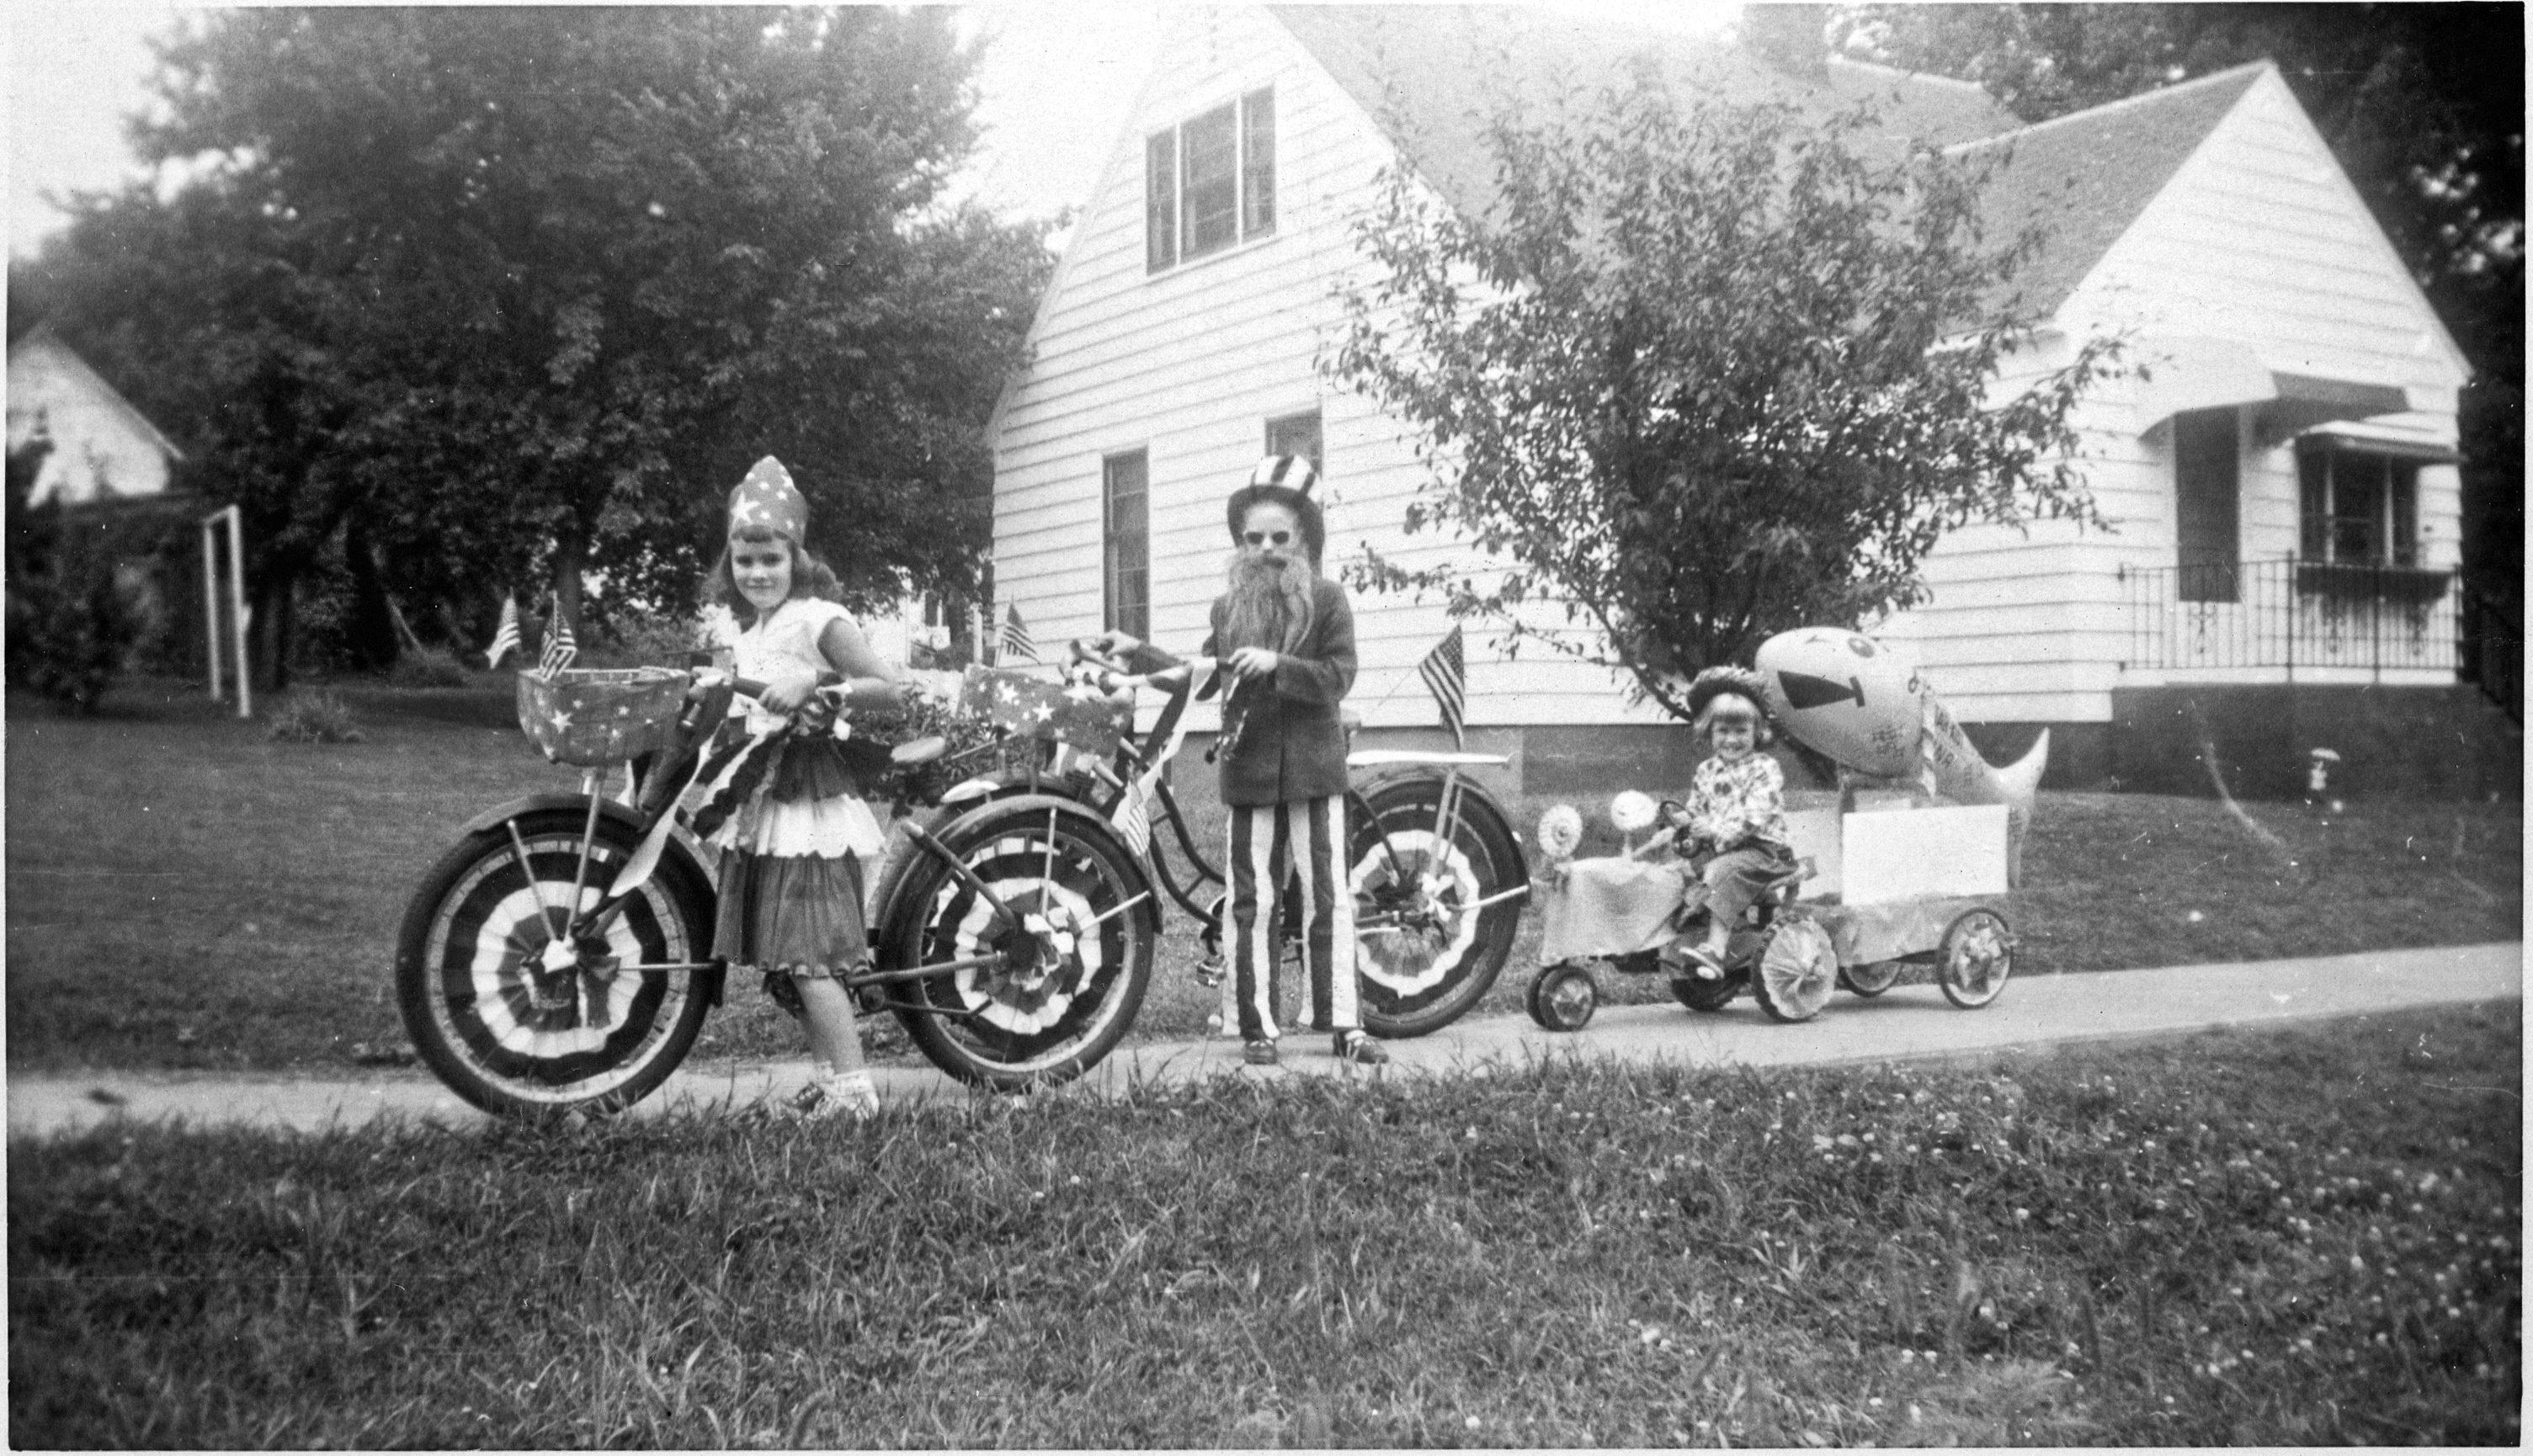 vintage 4th of july